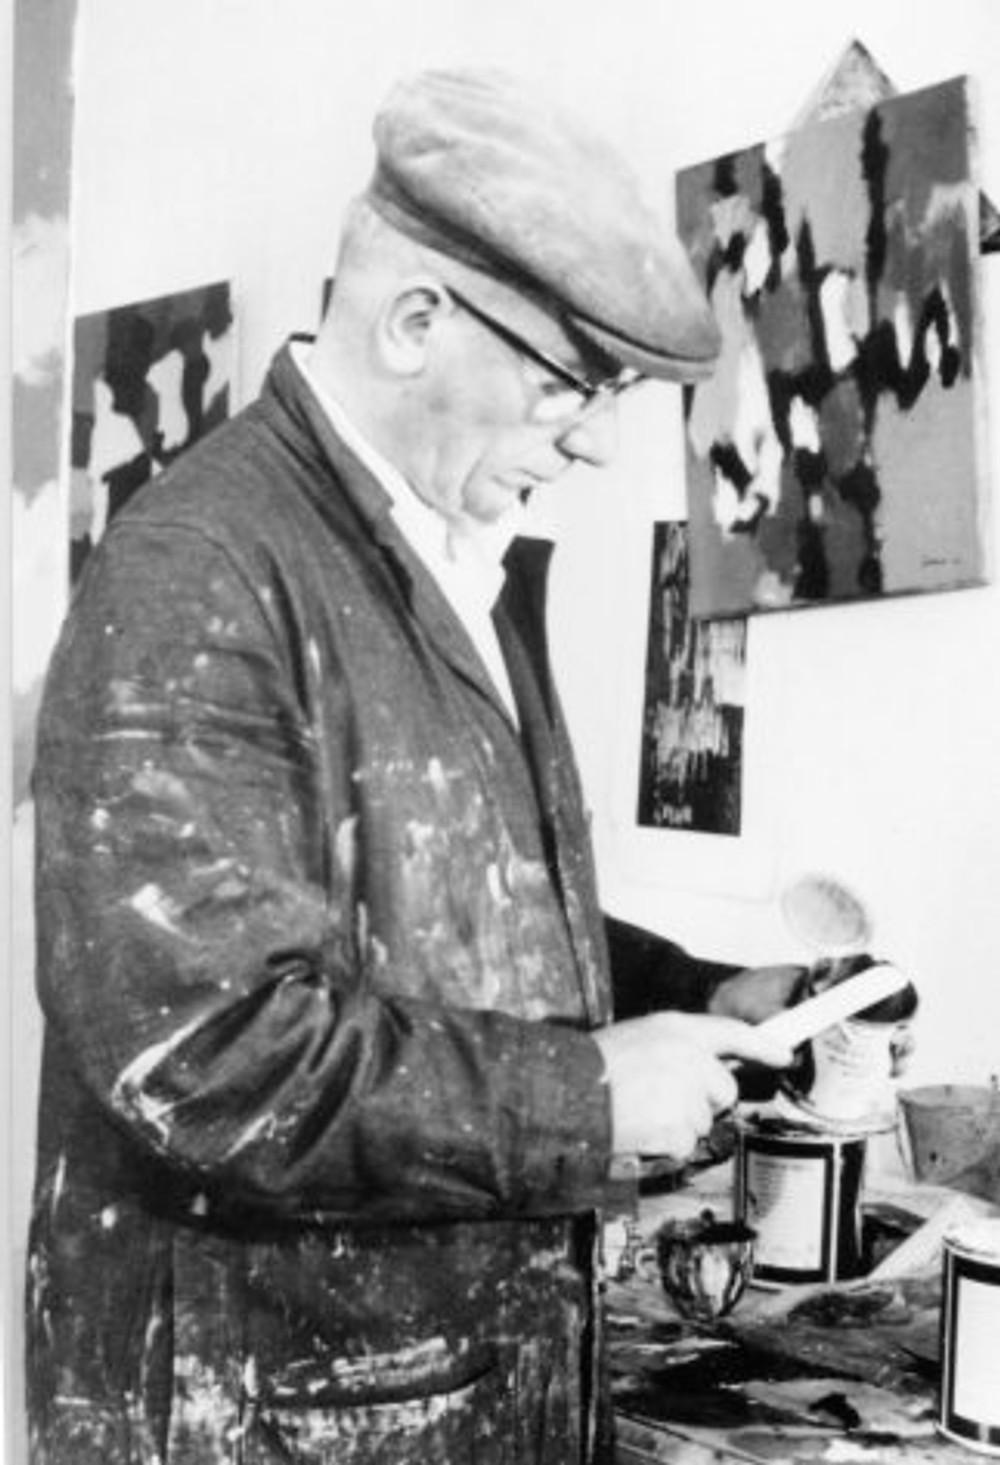 William Gear in his studio, Towner Art Galley, Eastbourne, 1962